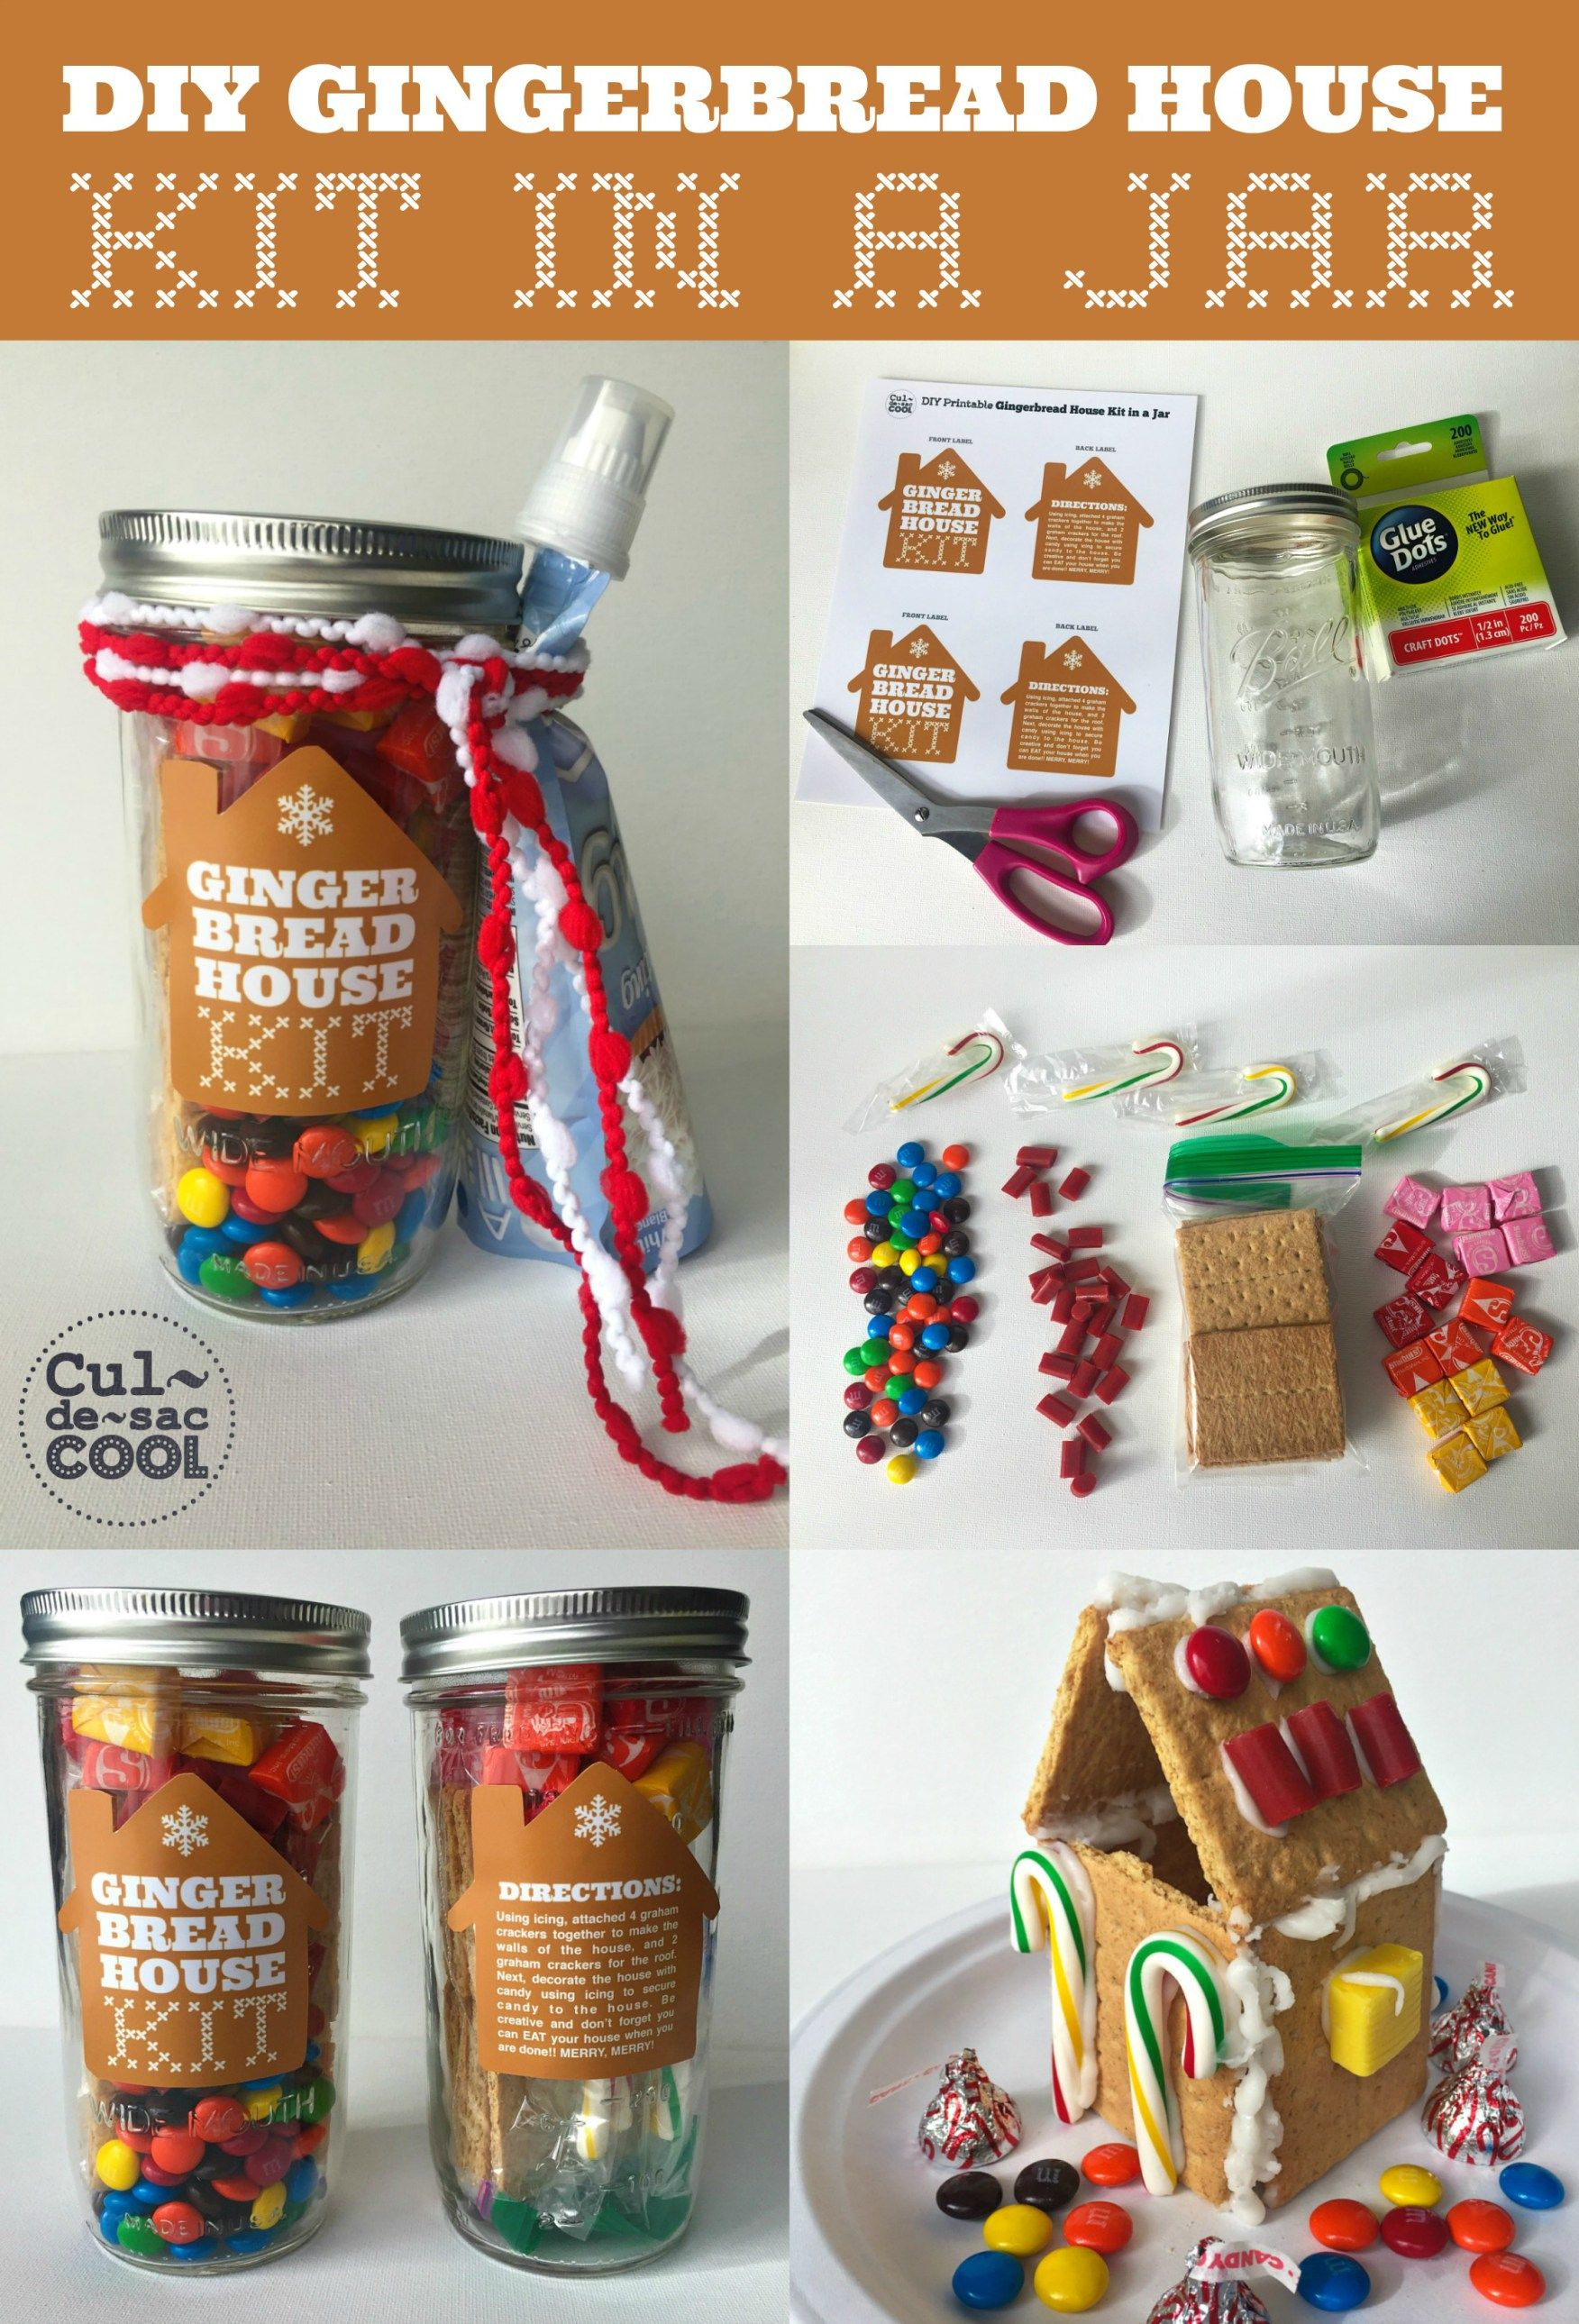 DIY Gingerbread House Kit in a Jar Gingerbread diy